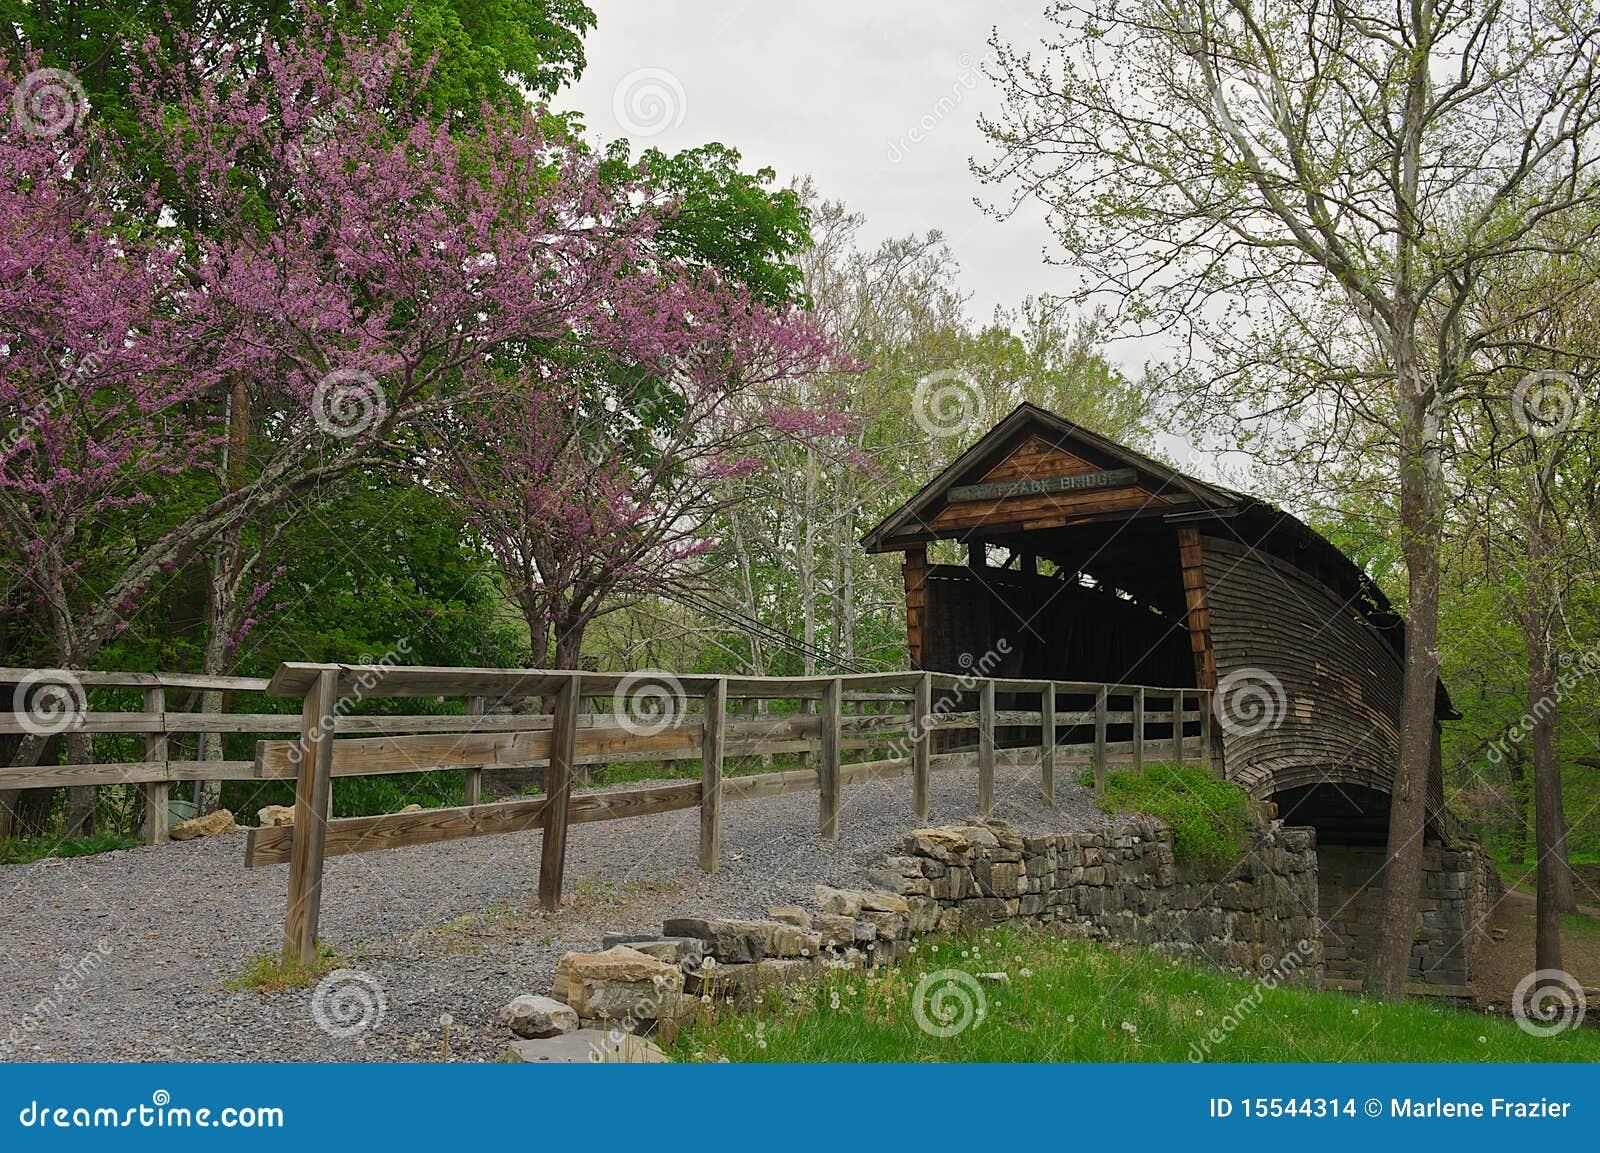 Humpback Bridge in Covington, Virginia.